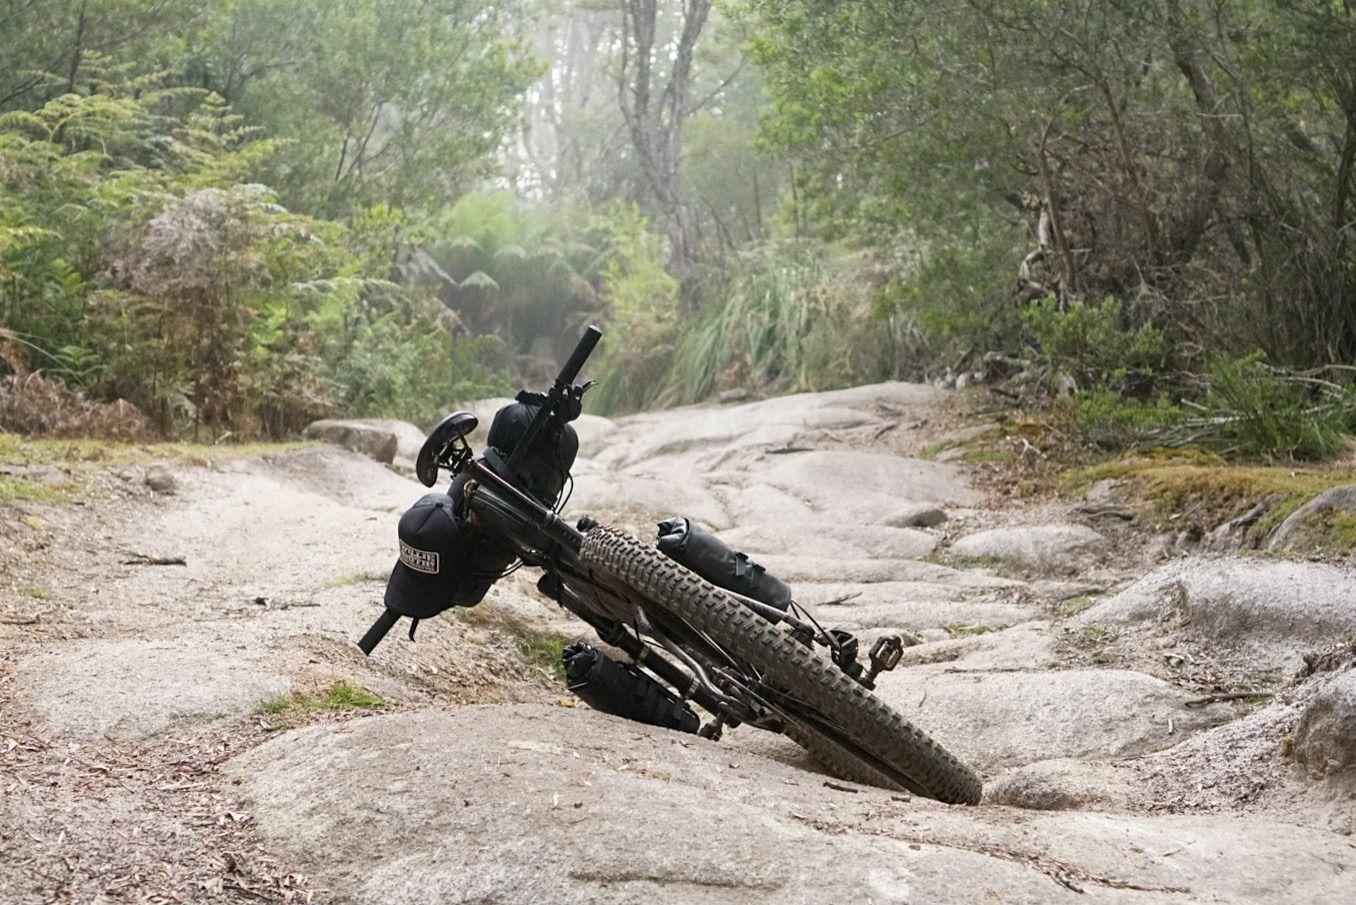 Hike a bike in Tasmania by Scott Mattern